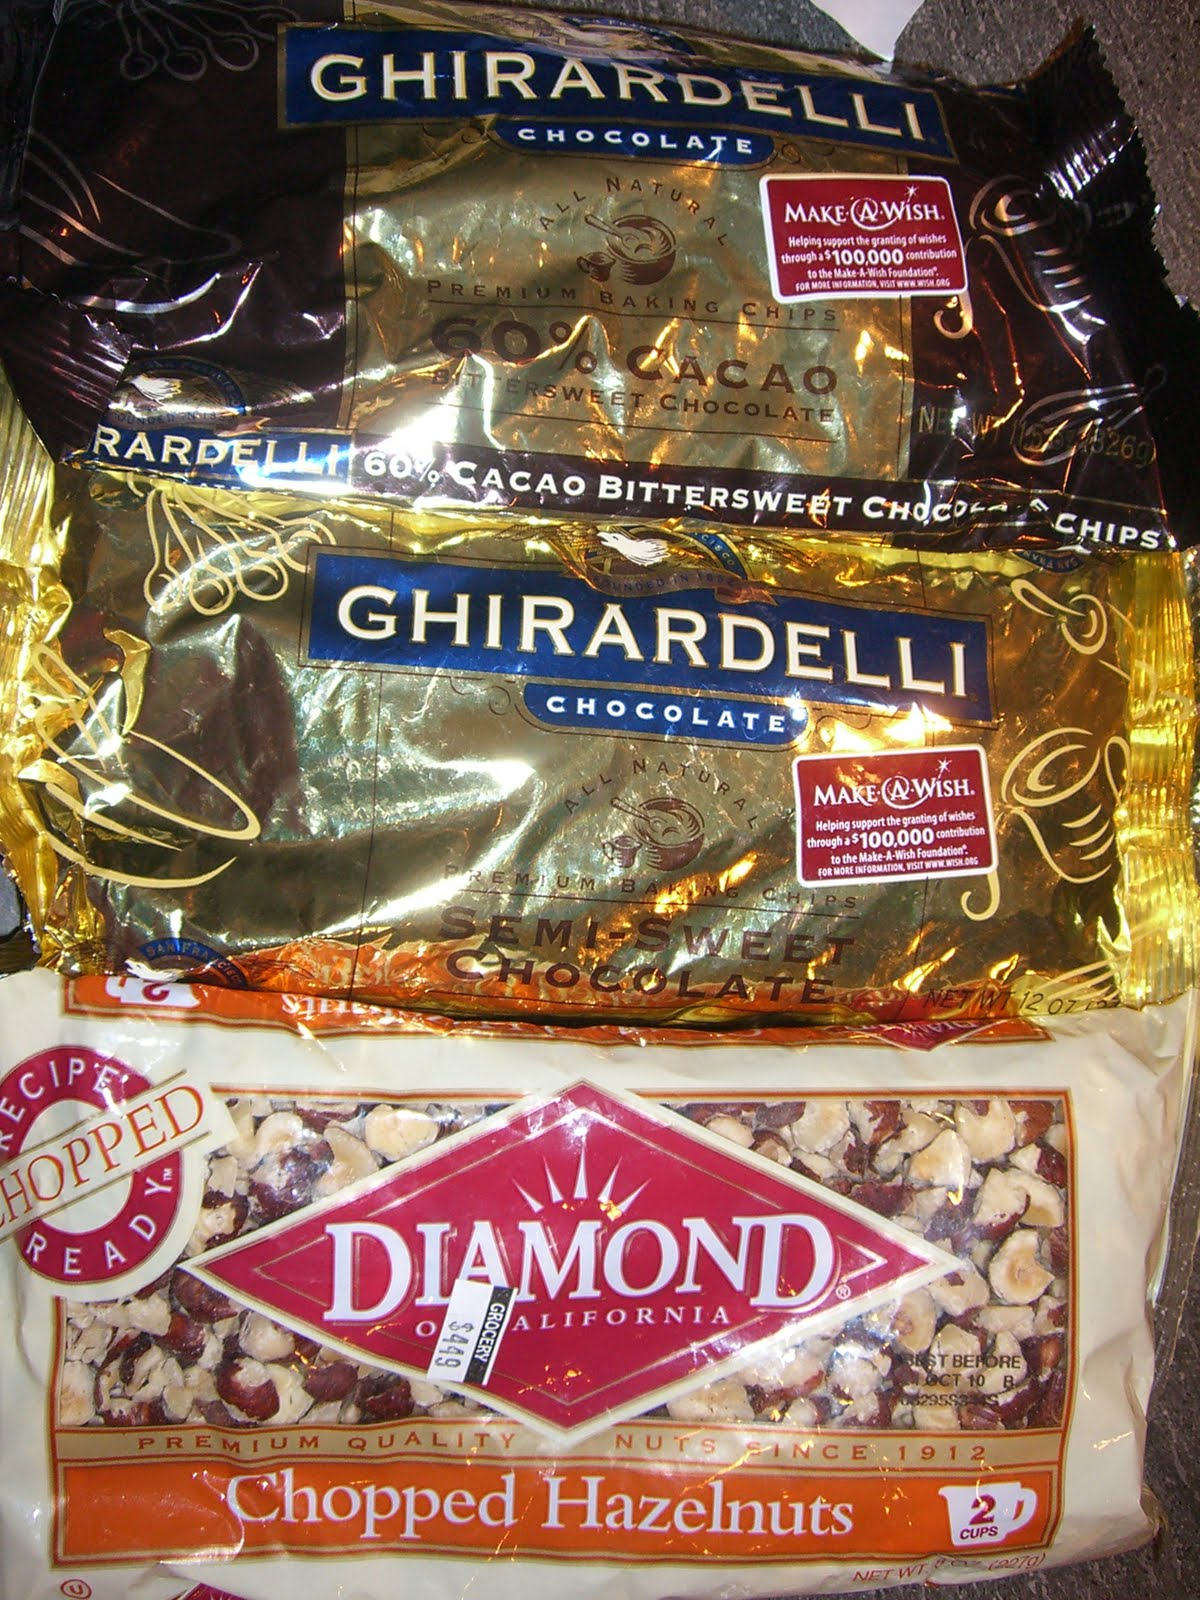 Ghirardelli Double Chocolate Cookies